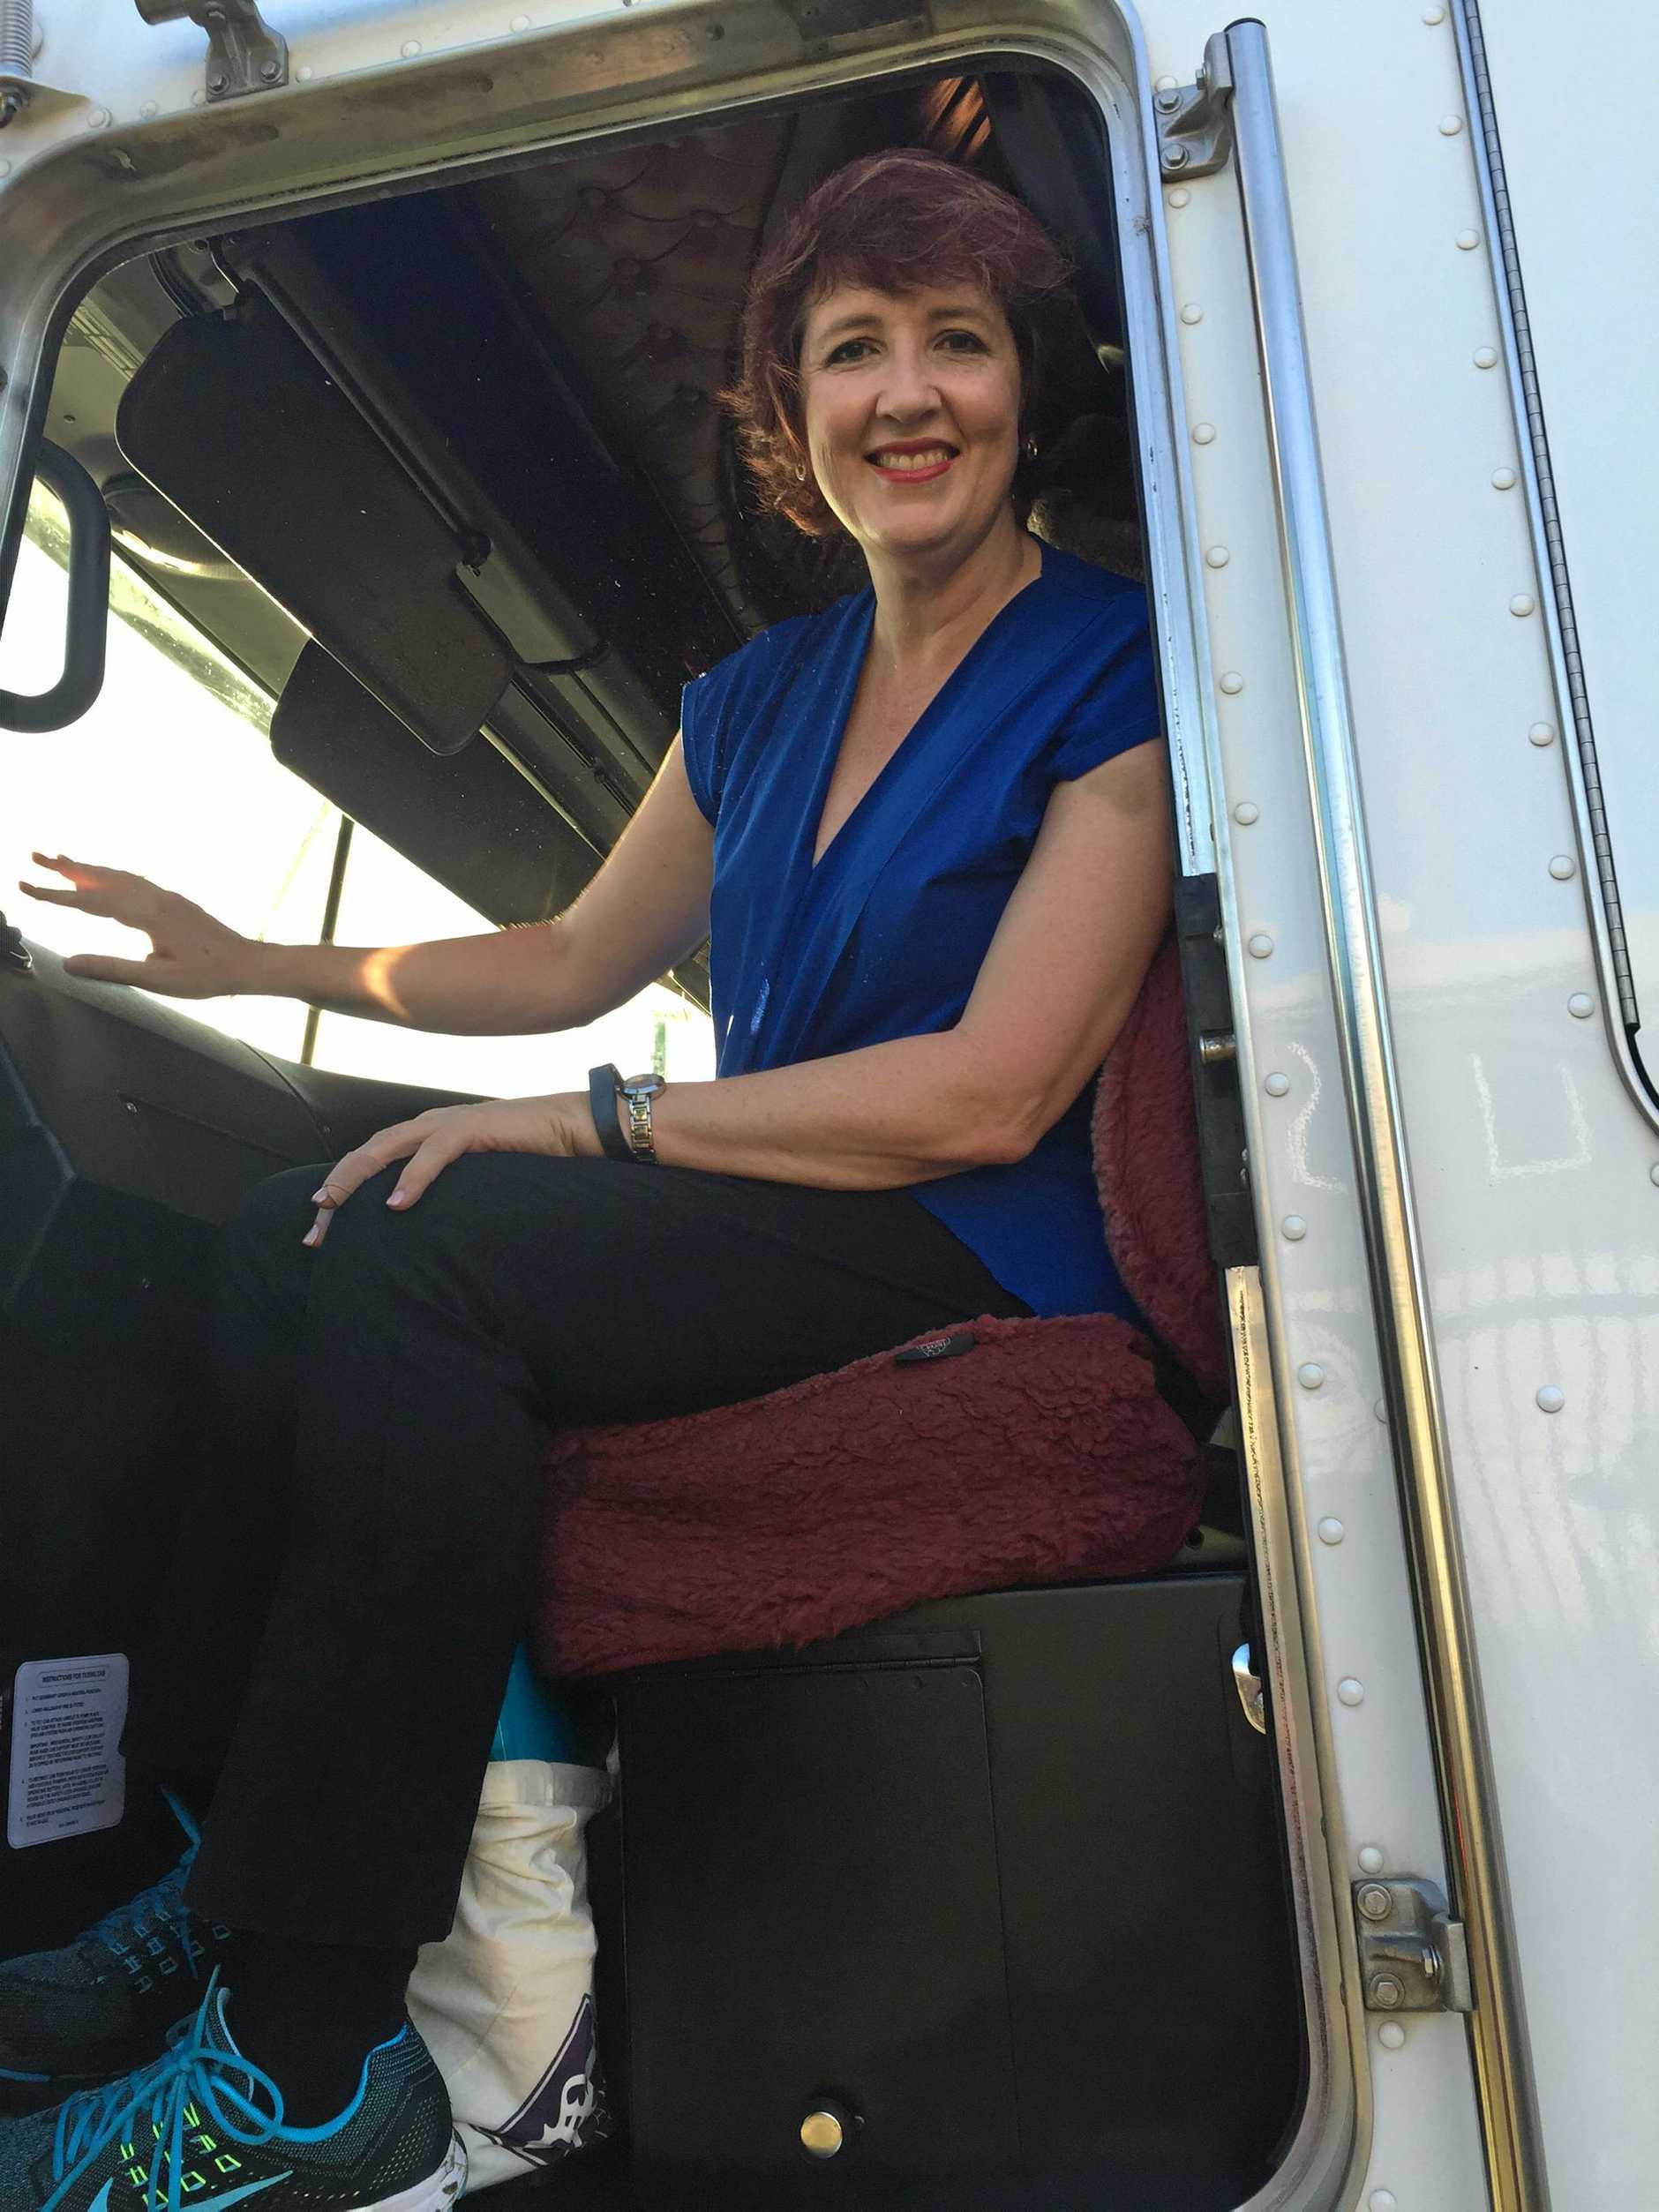 Member for Maroochydore, Fiona Simpson